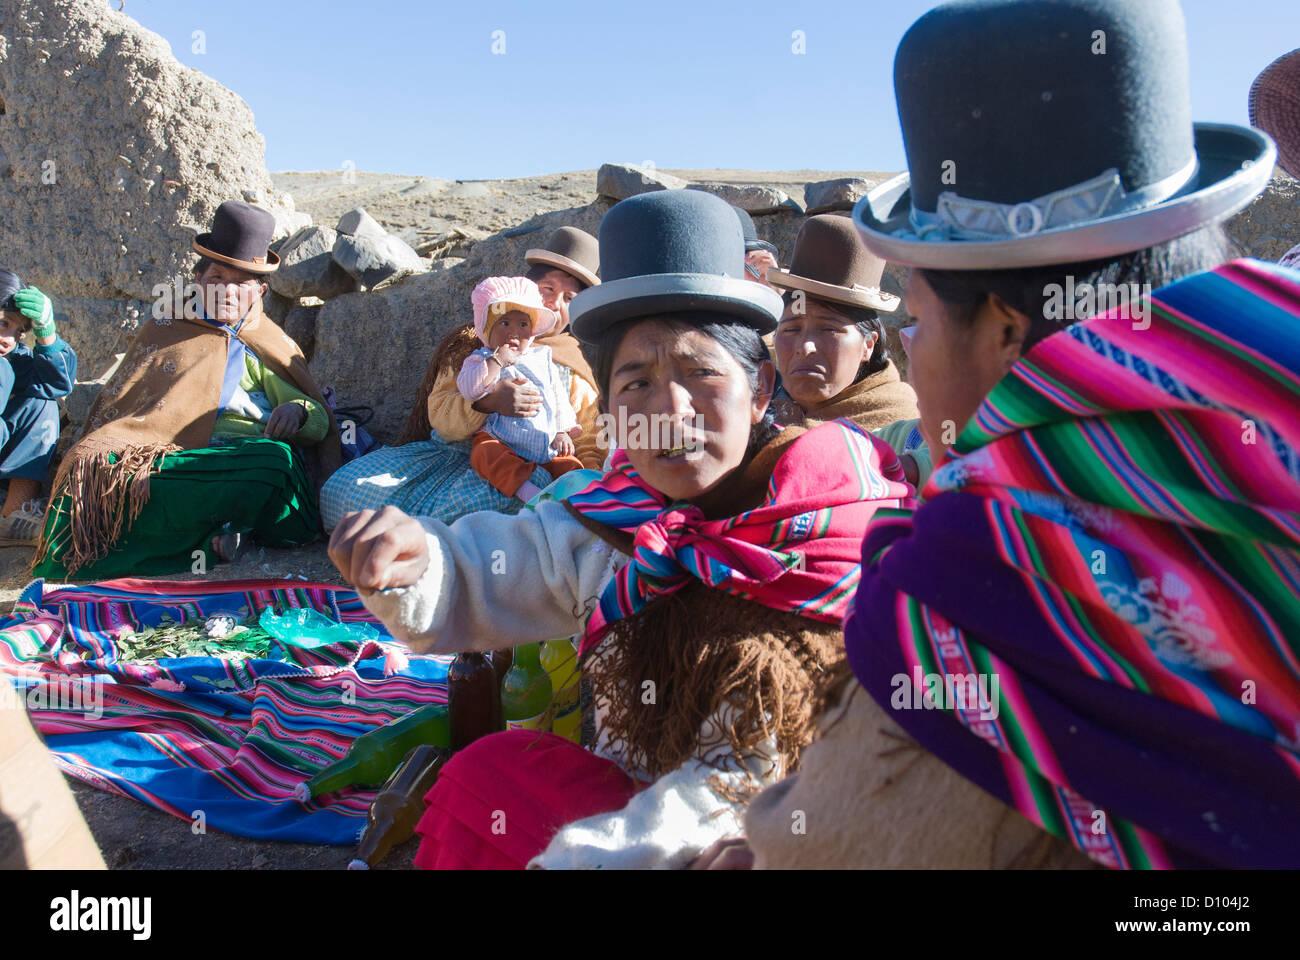 Meeting of aymara women in the Cordillera Real - Stock Image